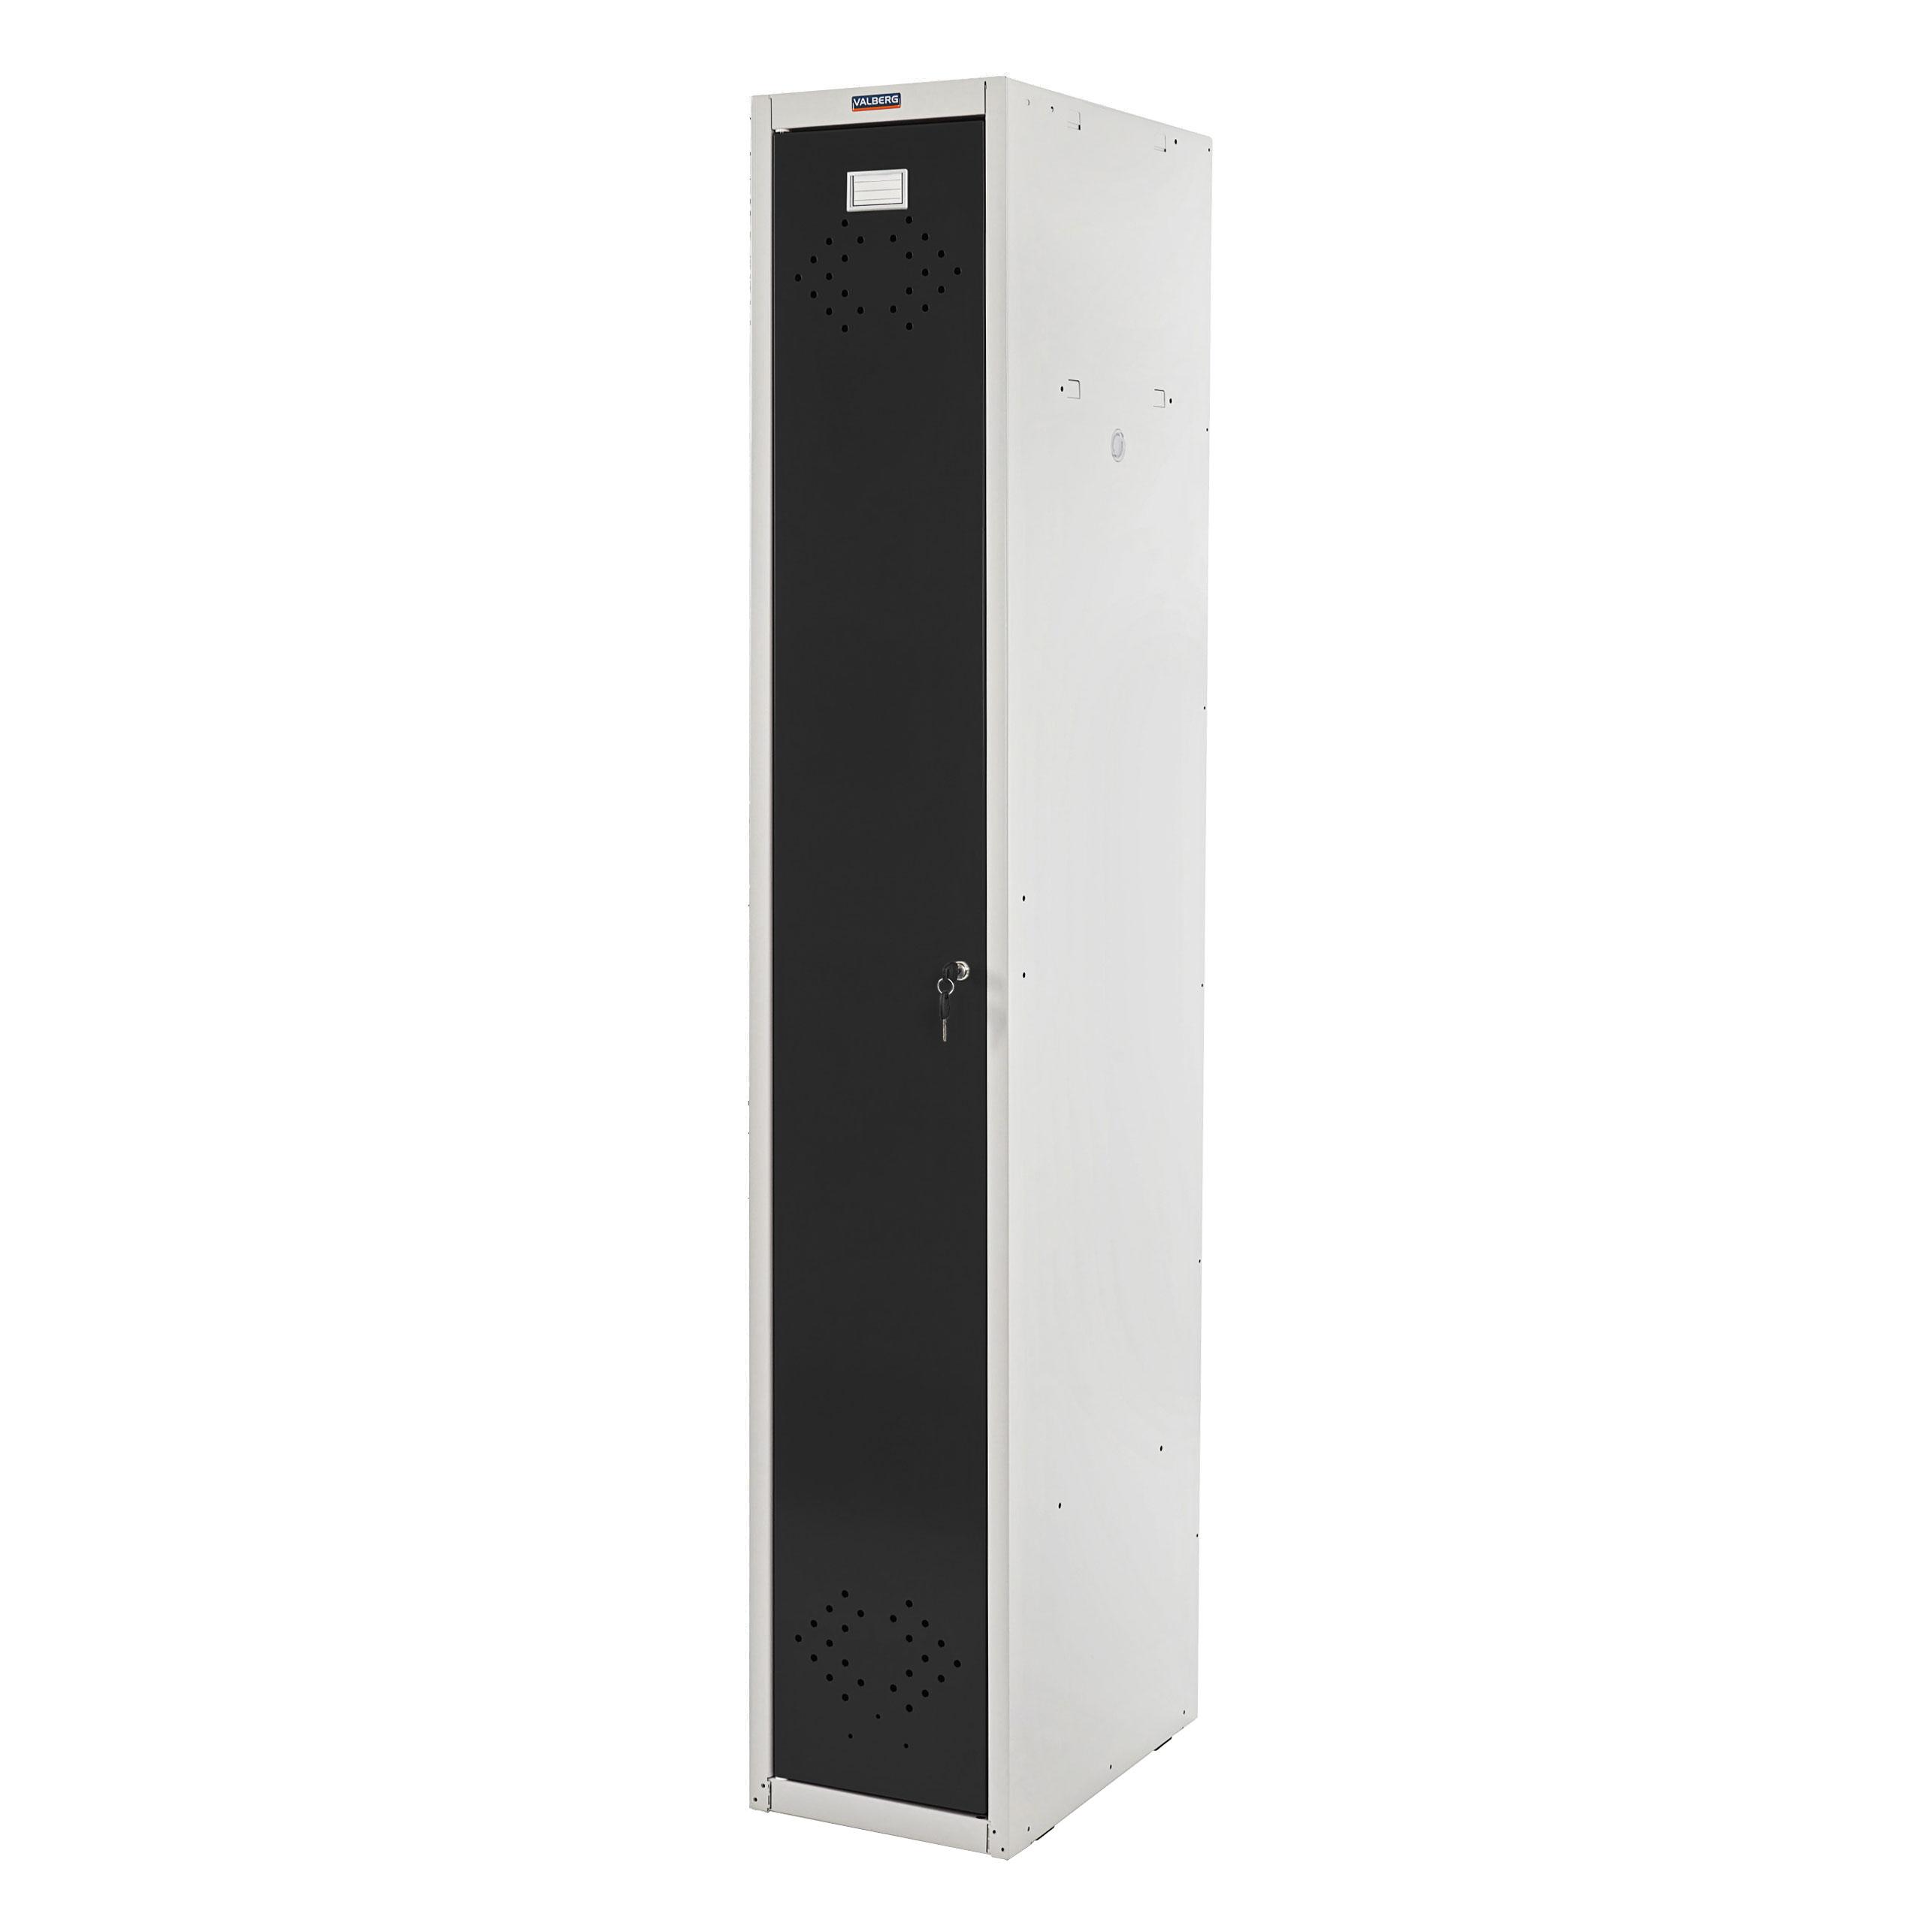 spind valberg t334 kleiderspind personalschrank 183x30x50cm nach asr ebay. Black Bedroom Furniture Sets. Home Design Ideas